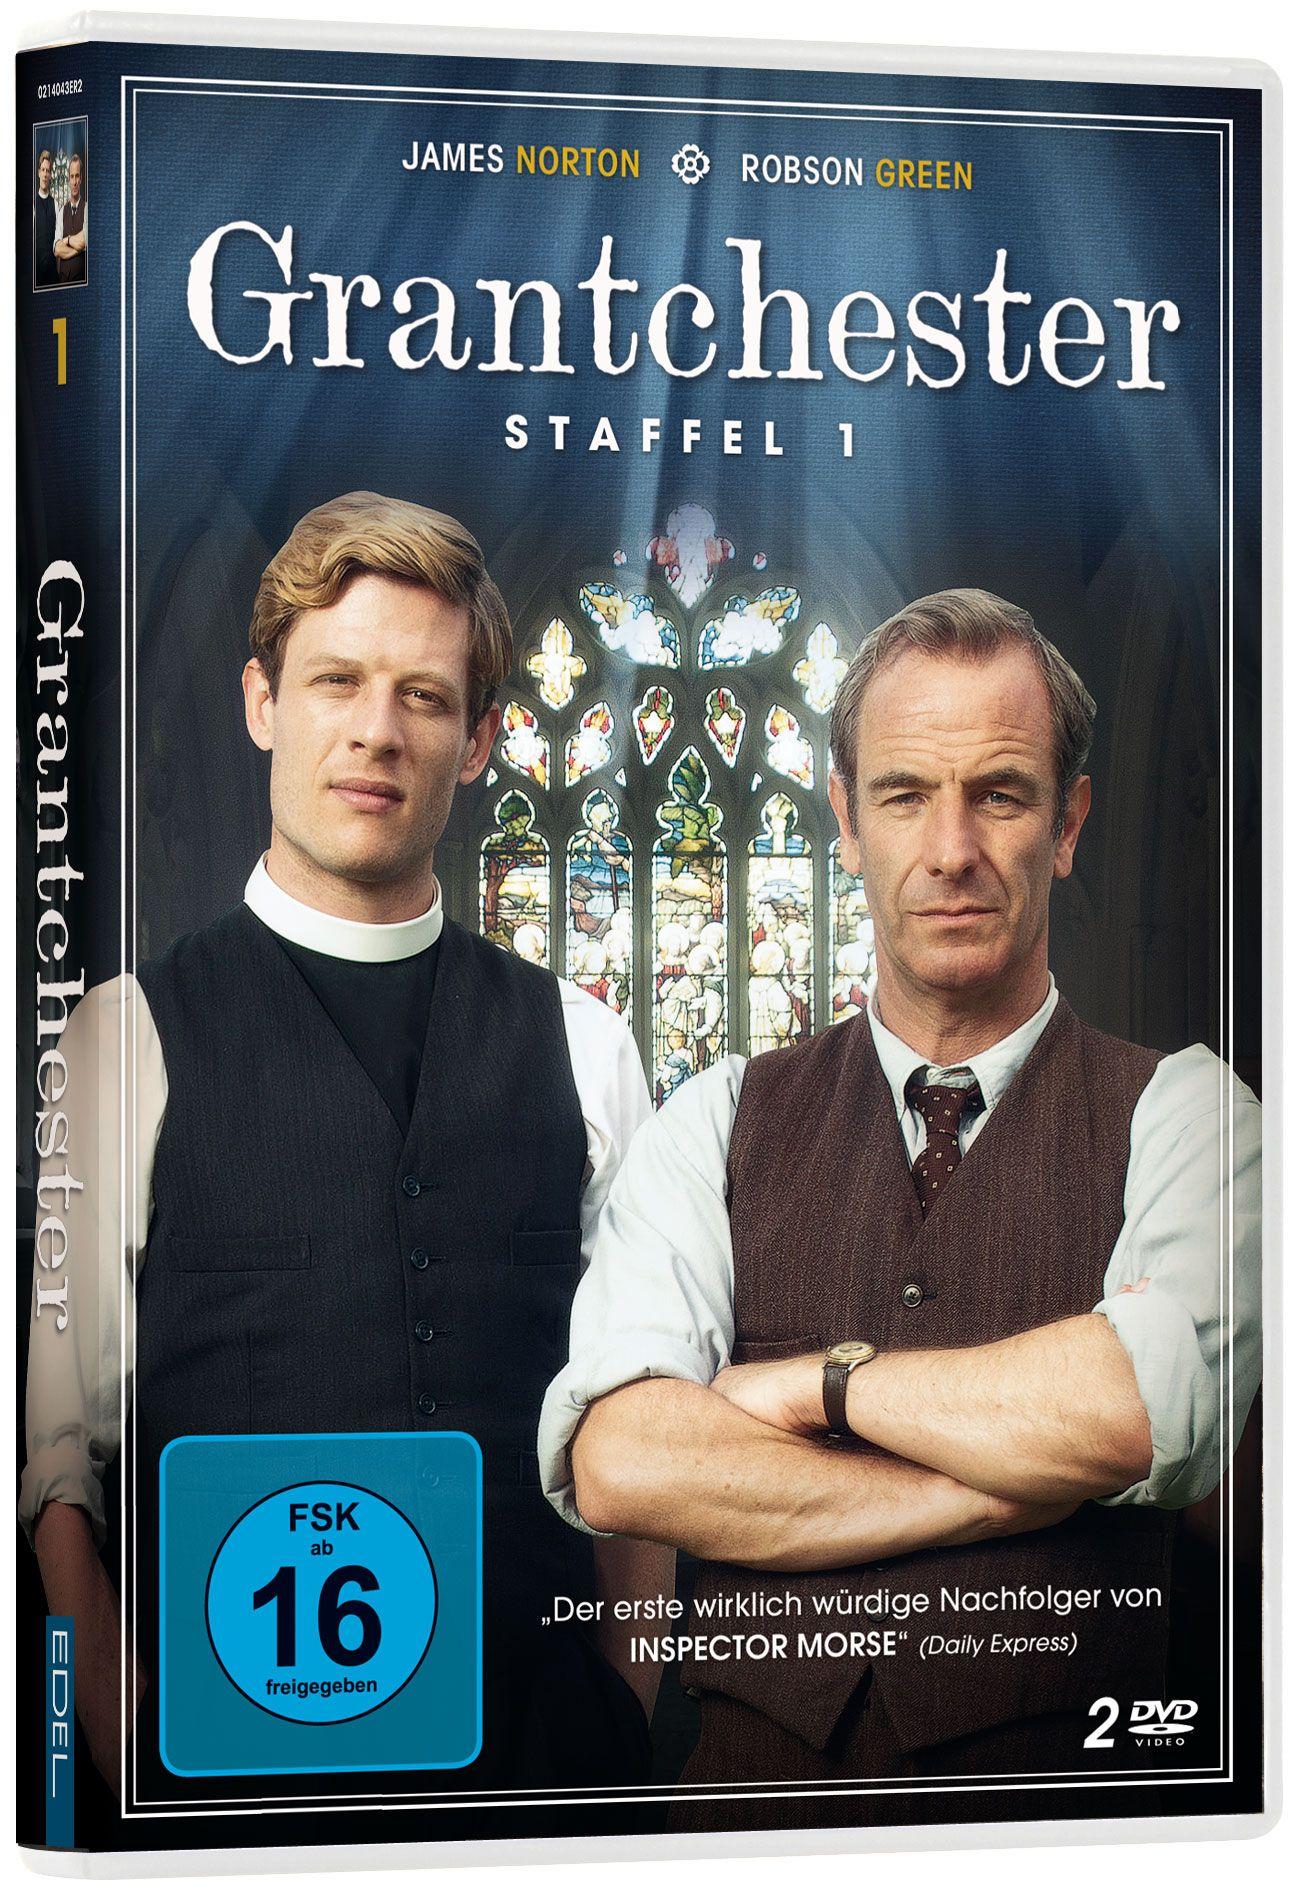 Grantchester - Staffel 1 DVD